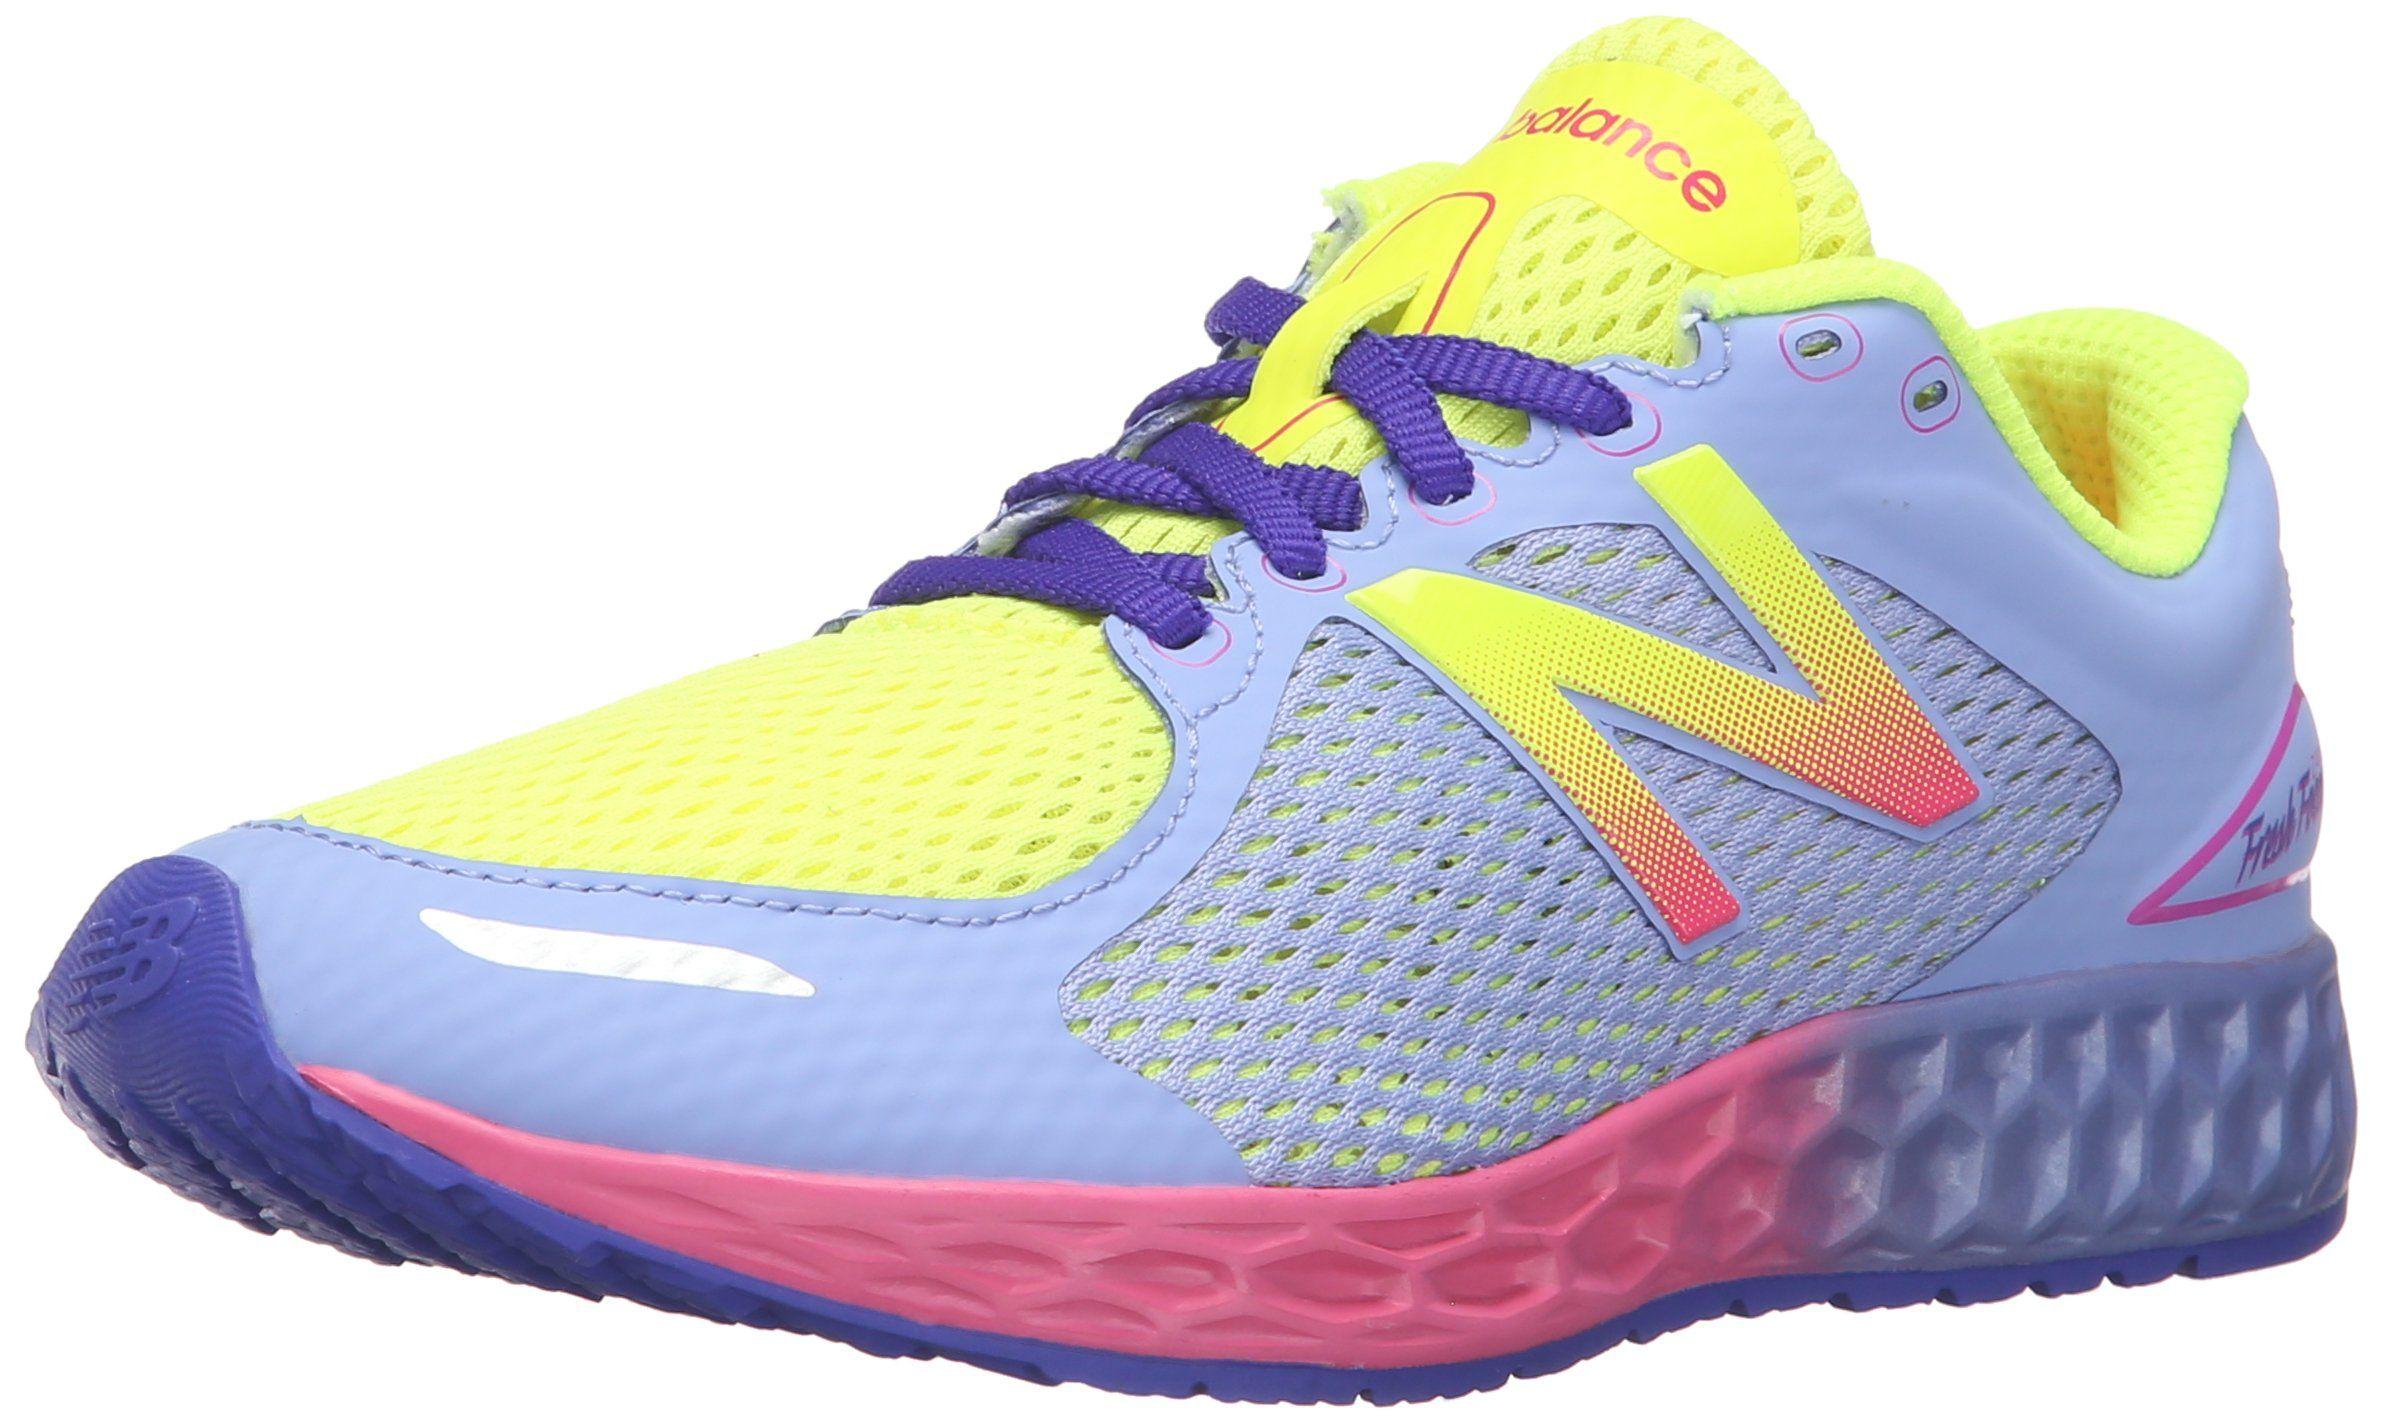 New Balance KJZNTV2 Youth Running Shoe